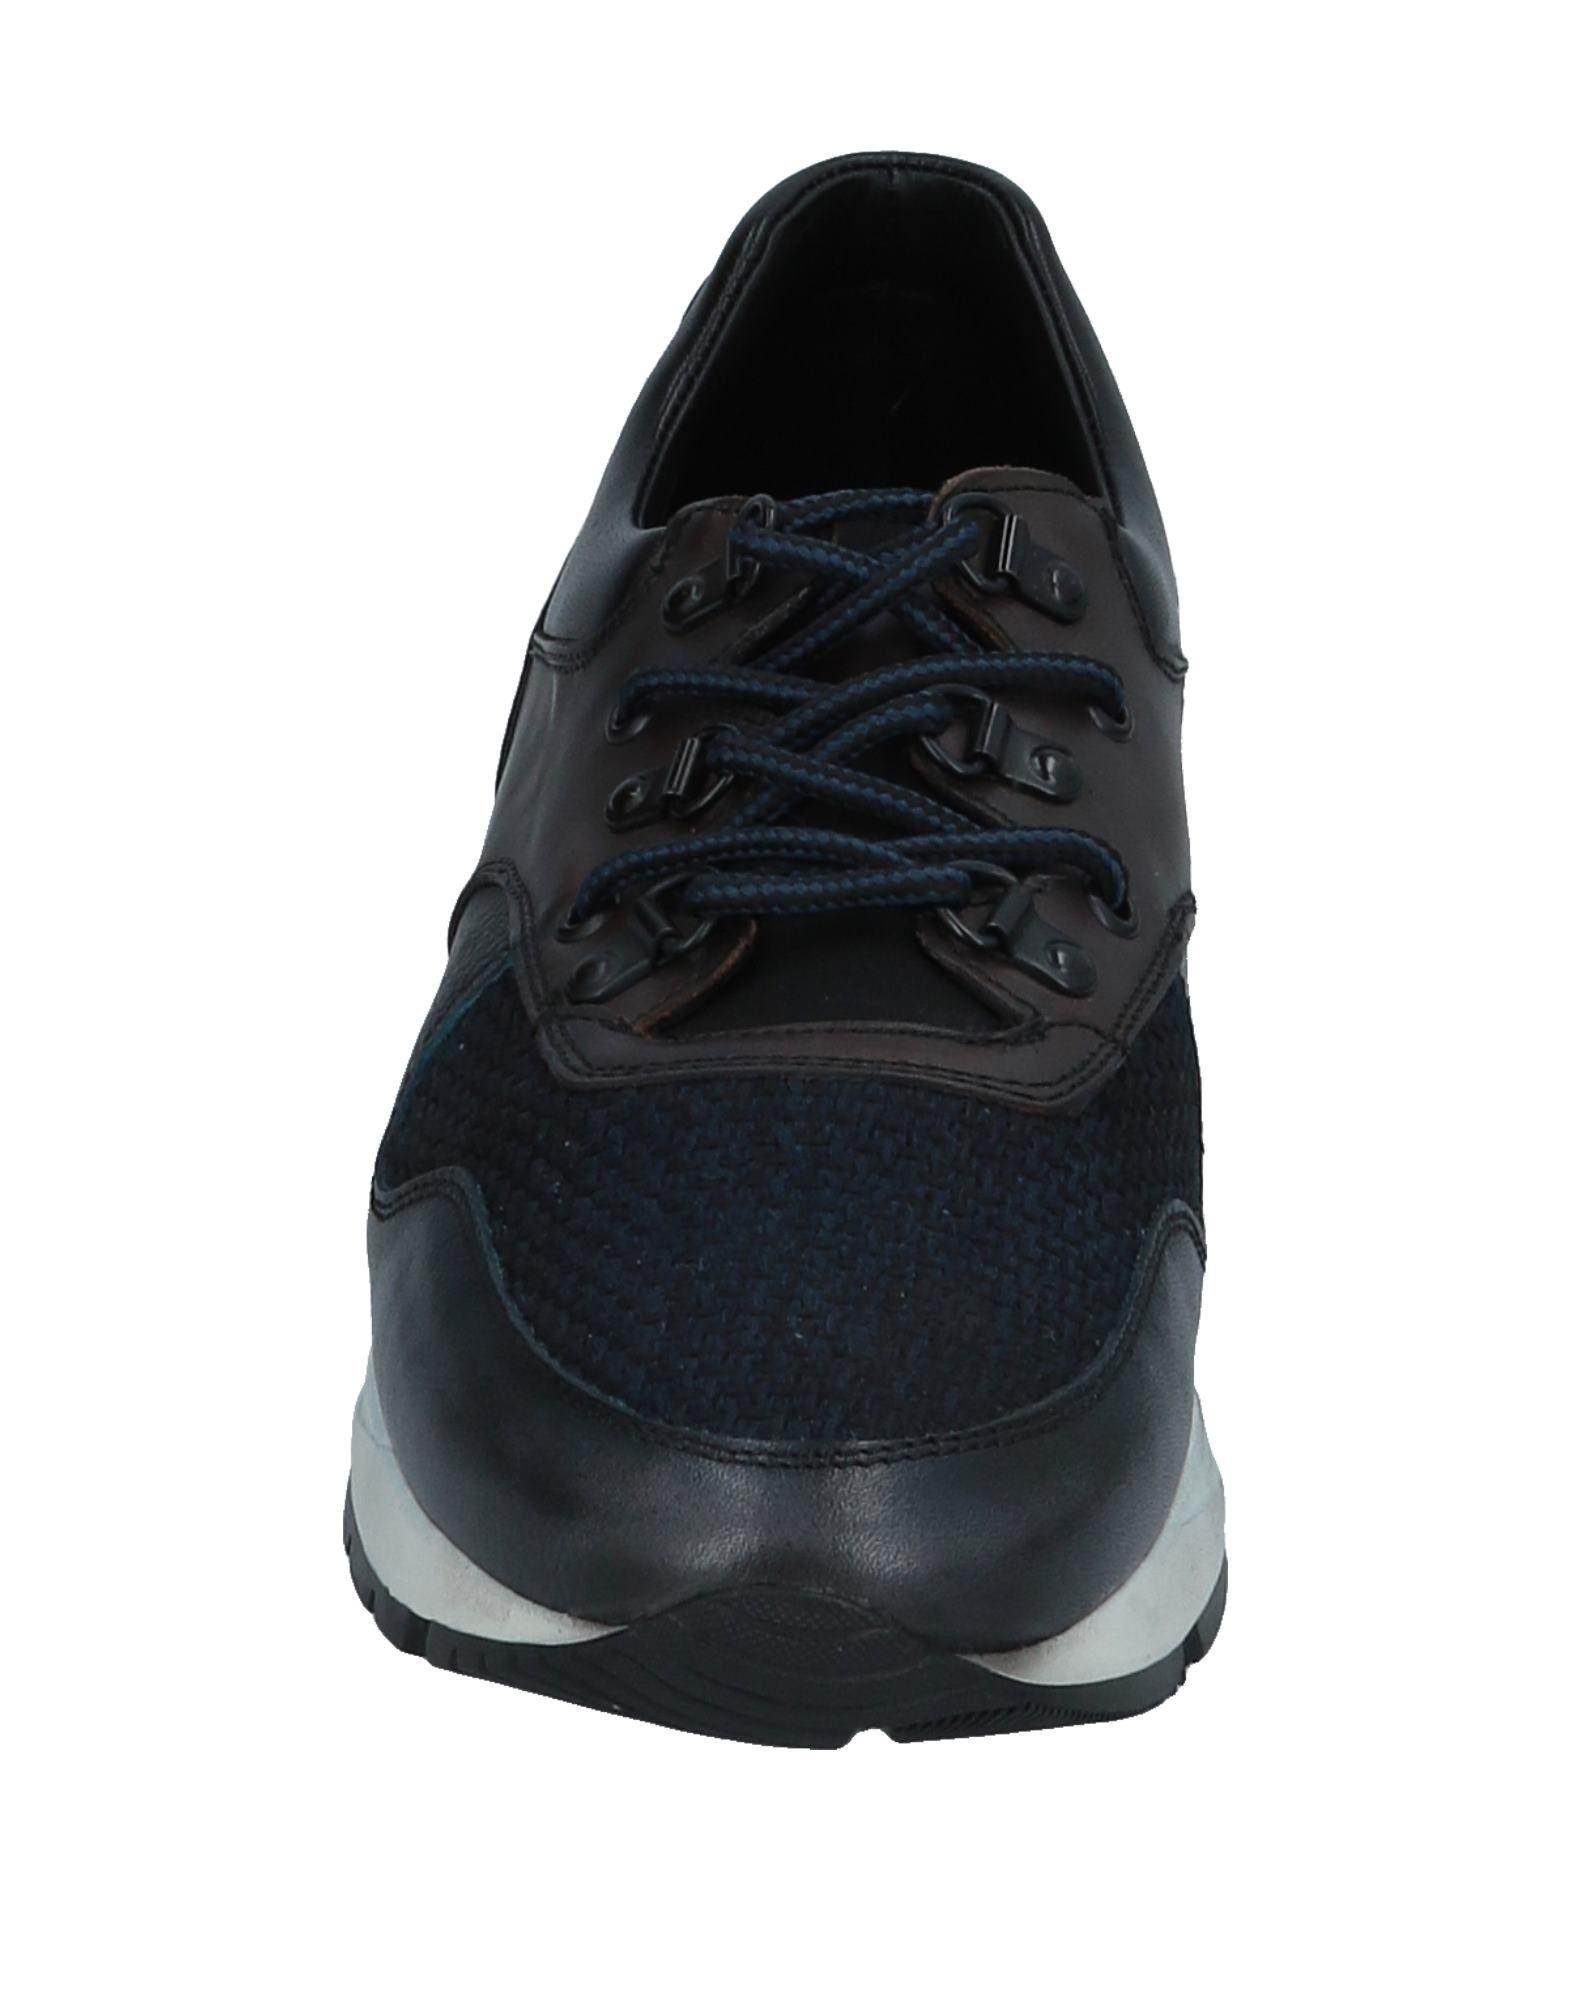 Amalfi Sneakers Herren  Schuhe 11534099RO Heiße Schuhe  922e8b